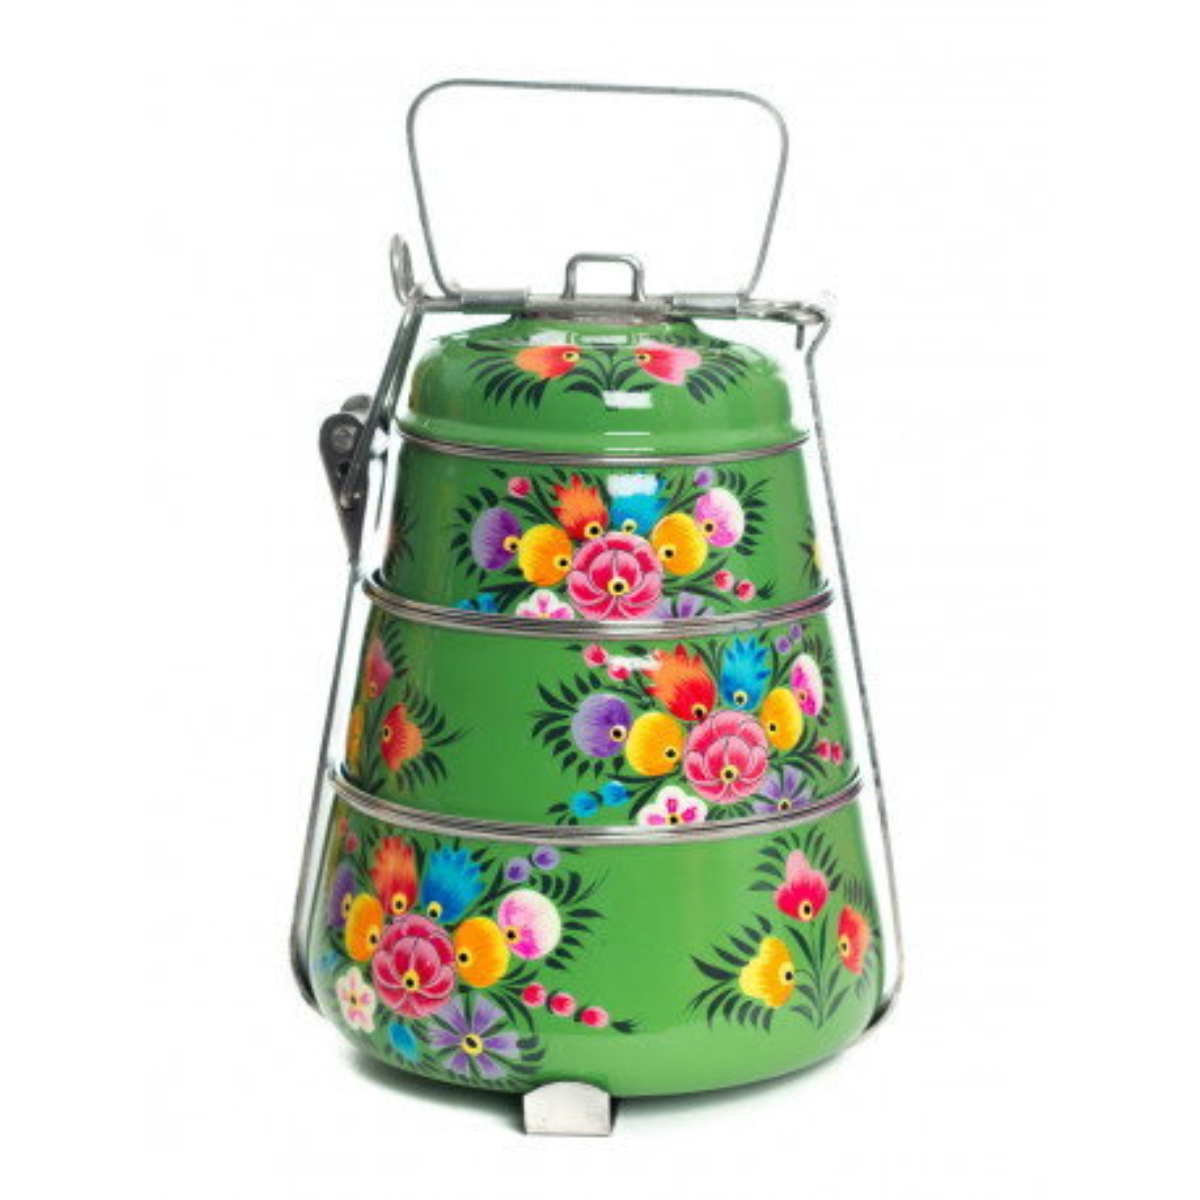 Lunch box inox peinte à la main Suraya